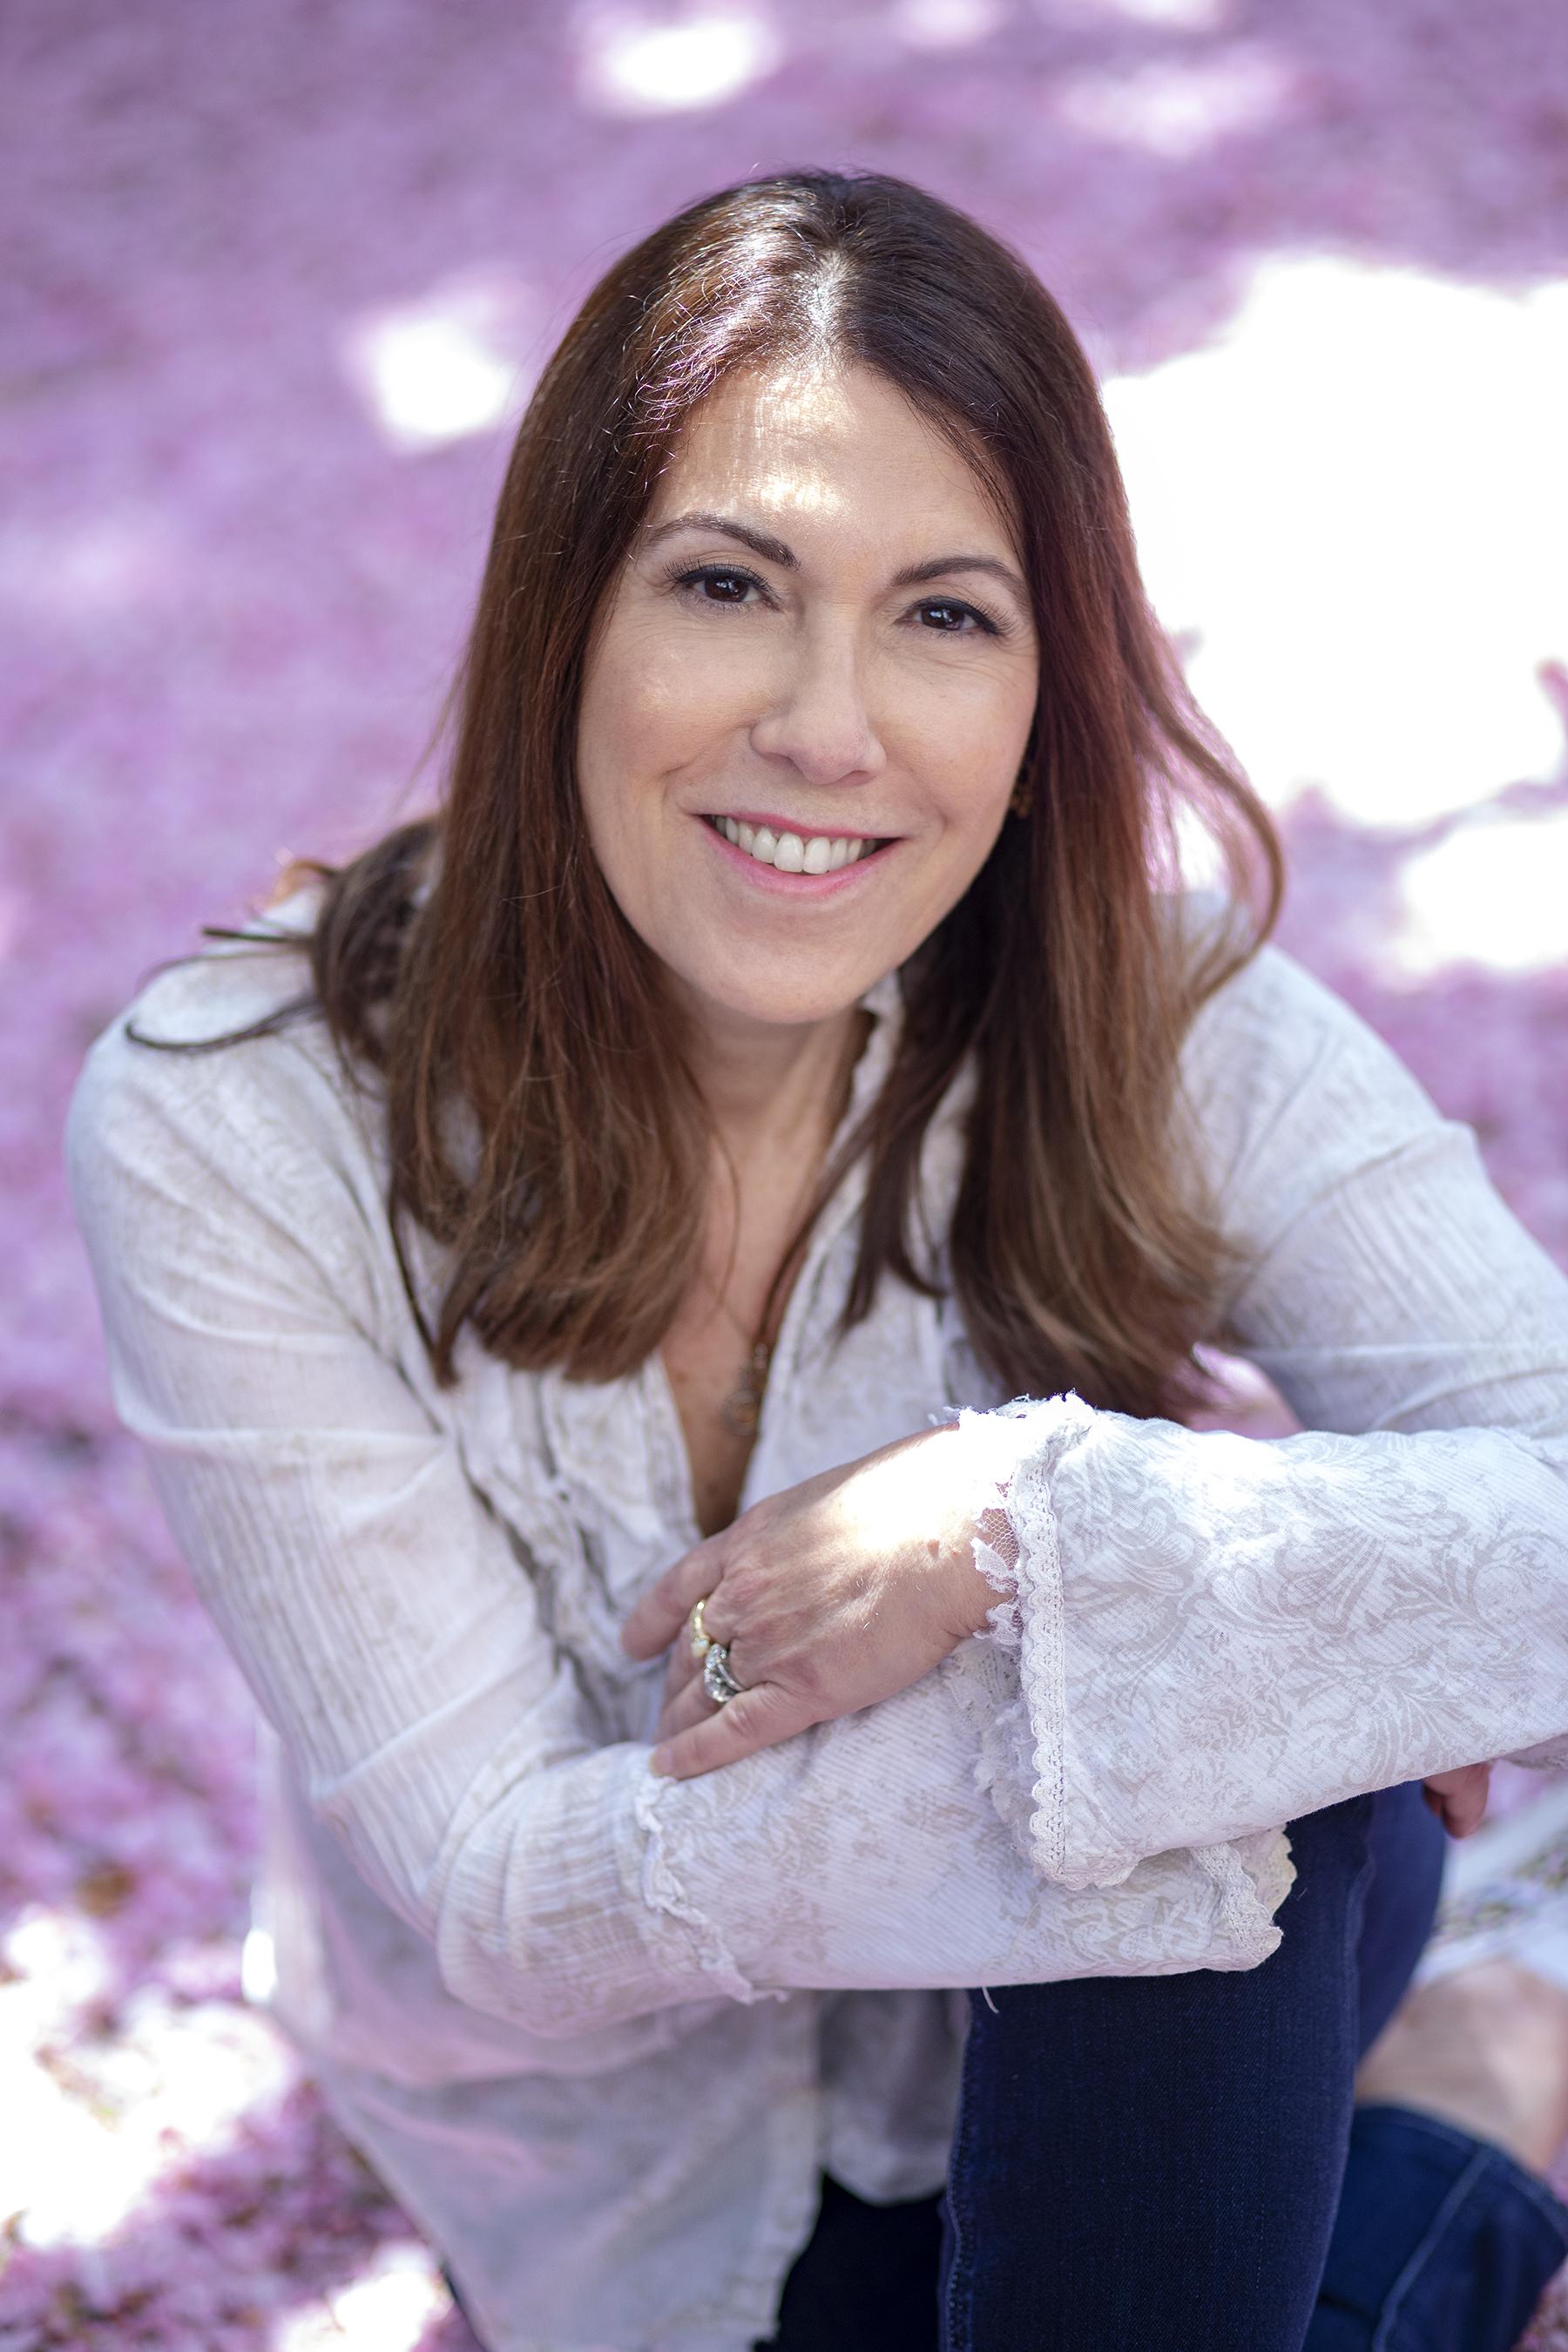 Laura Lagano, MS, RDN, CDN